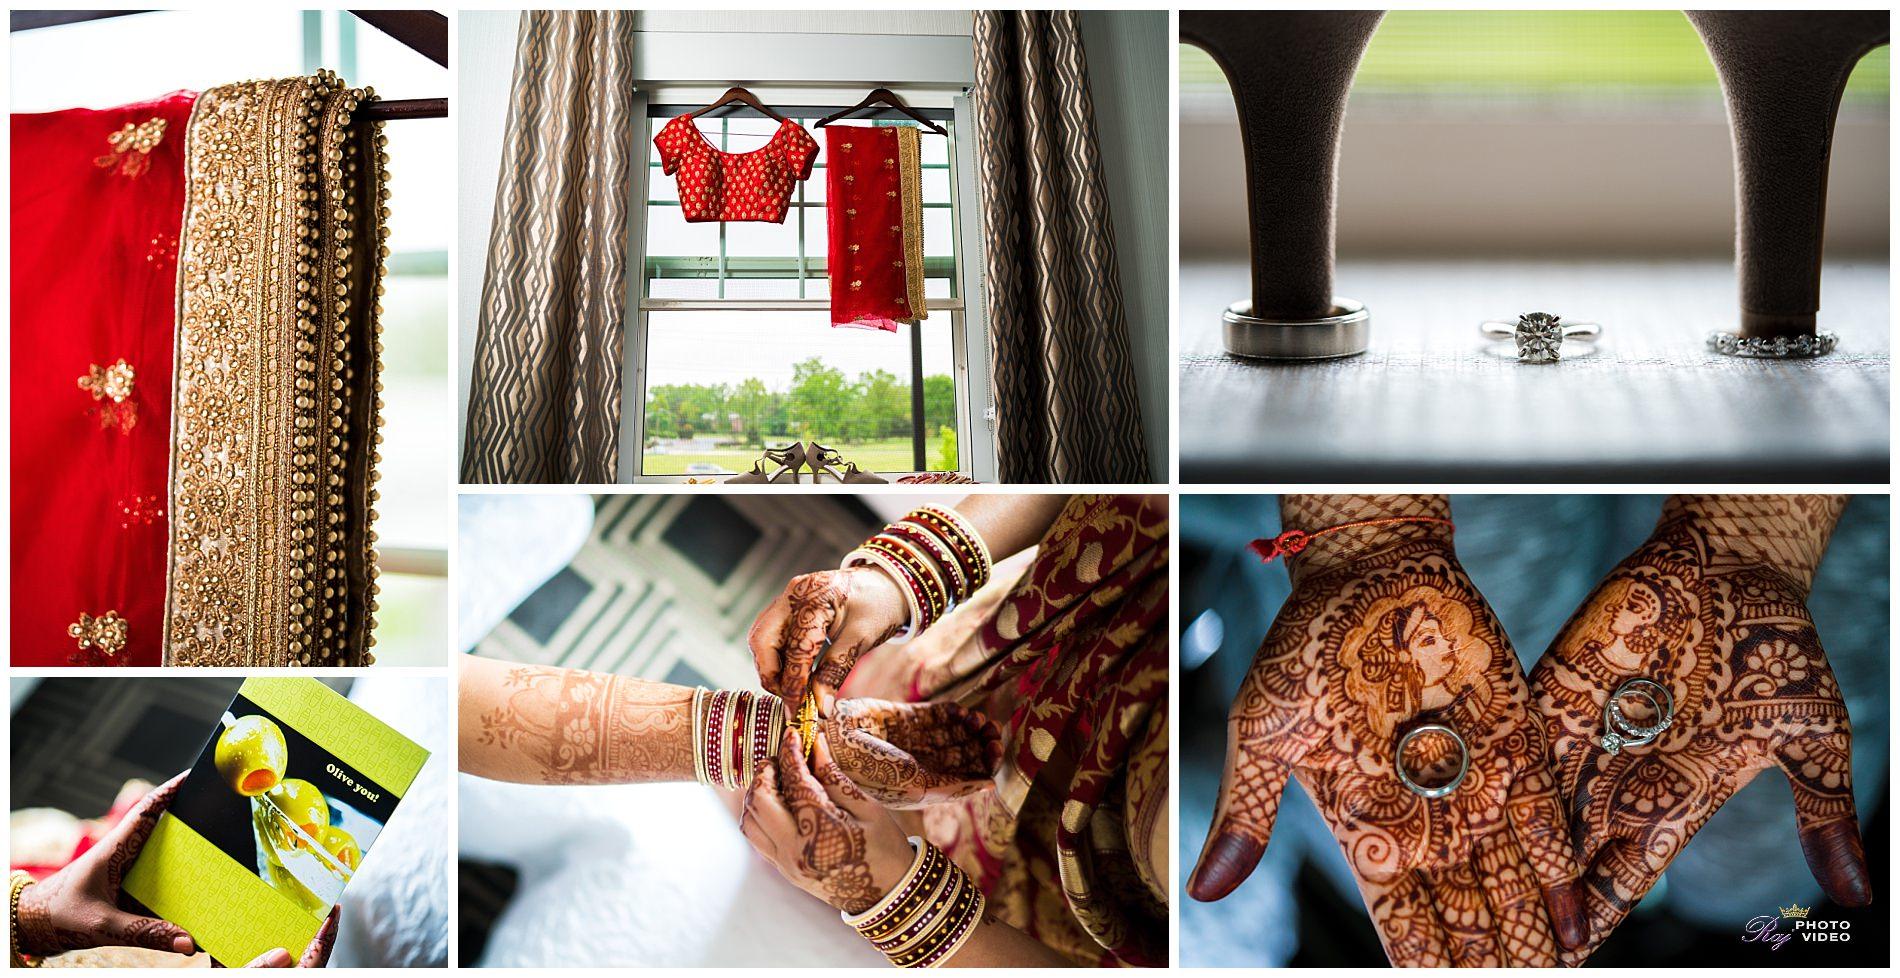 Martinsville-Gardens-NJ-Indian-Wedding-Ruchi-Vishal-1.jpg